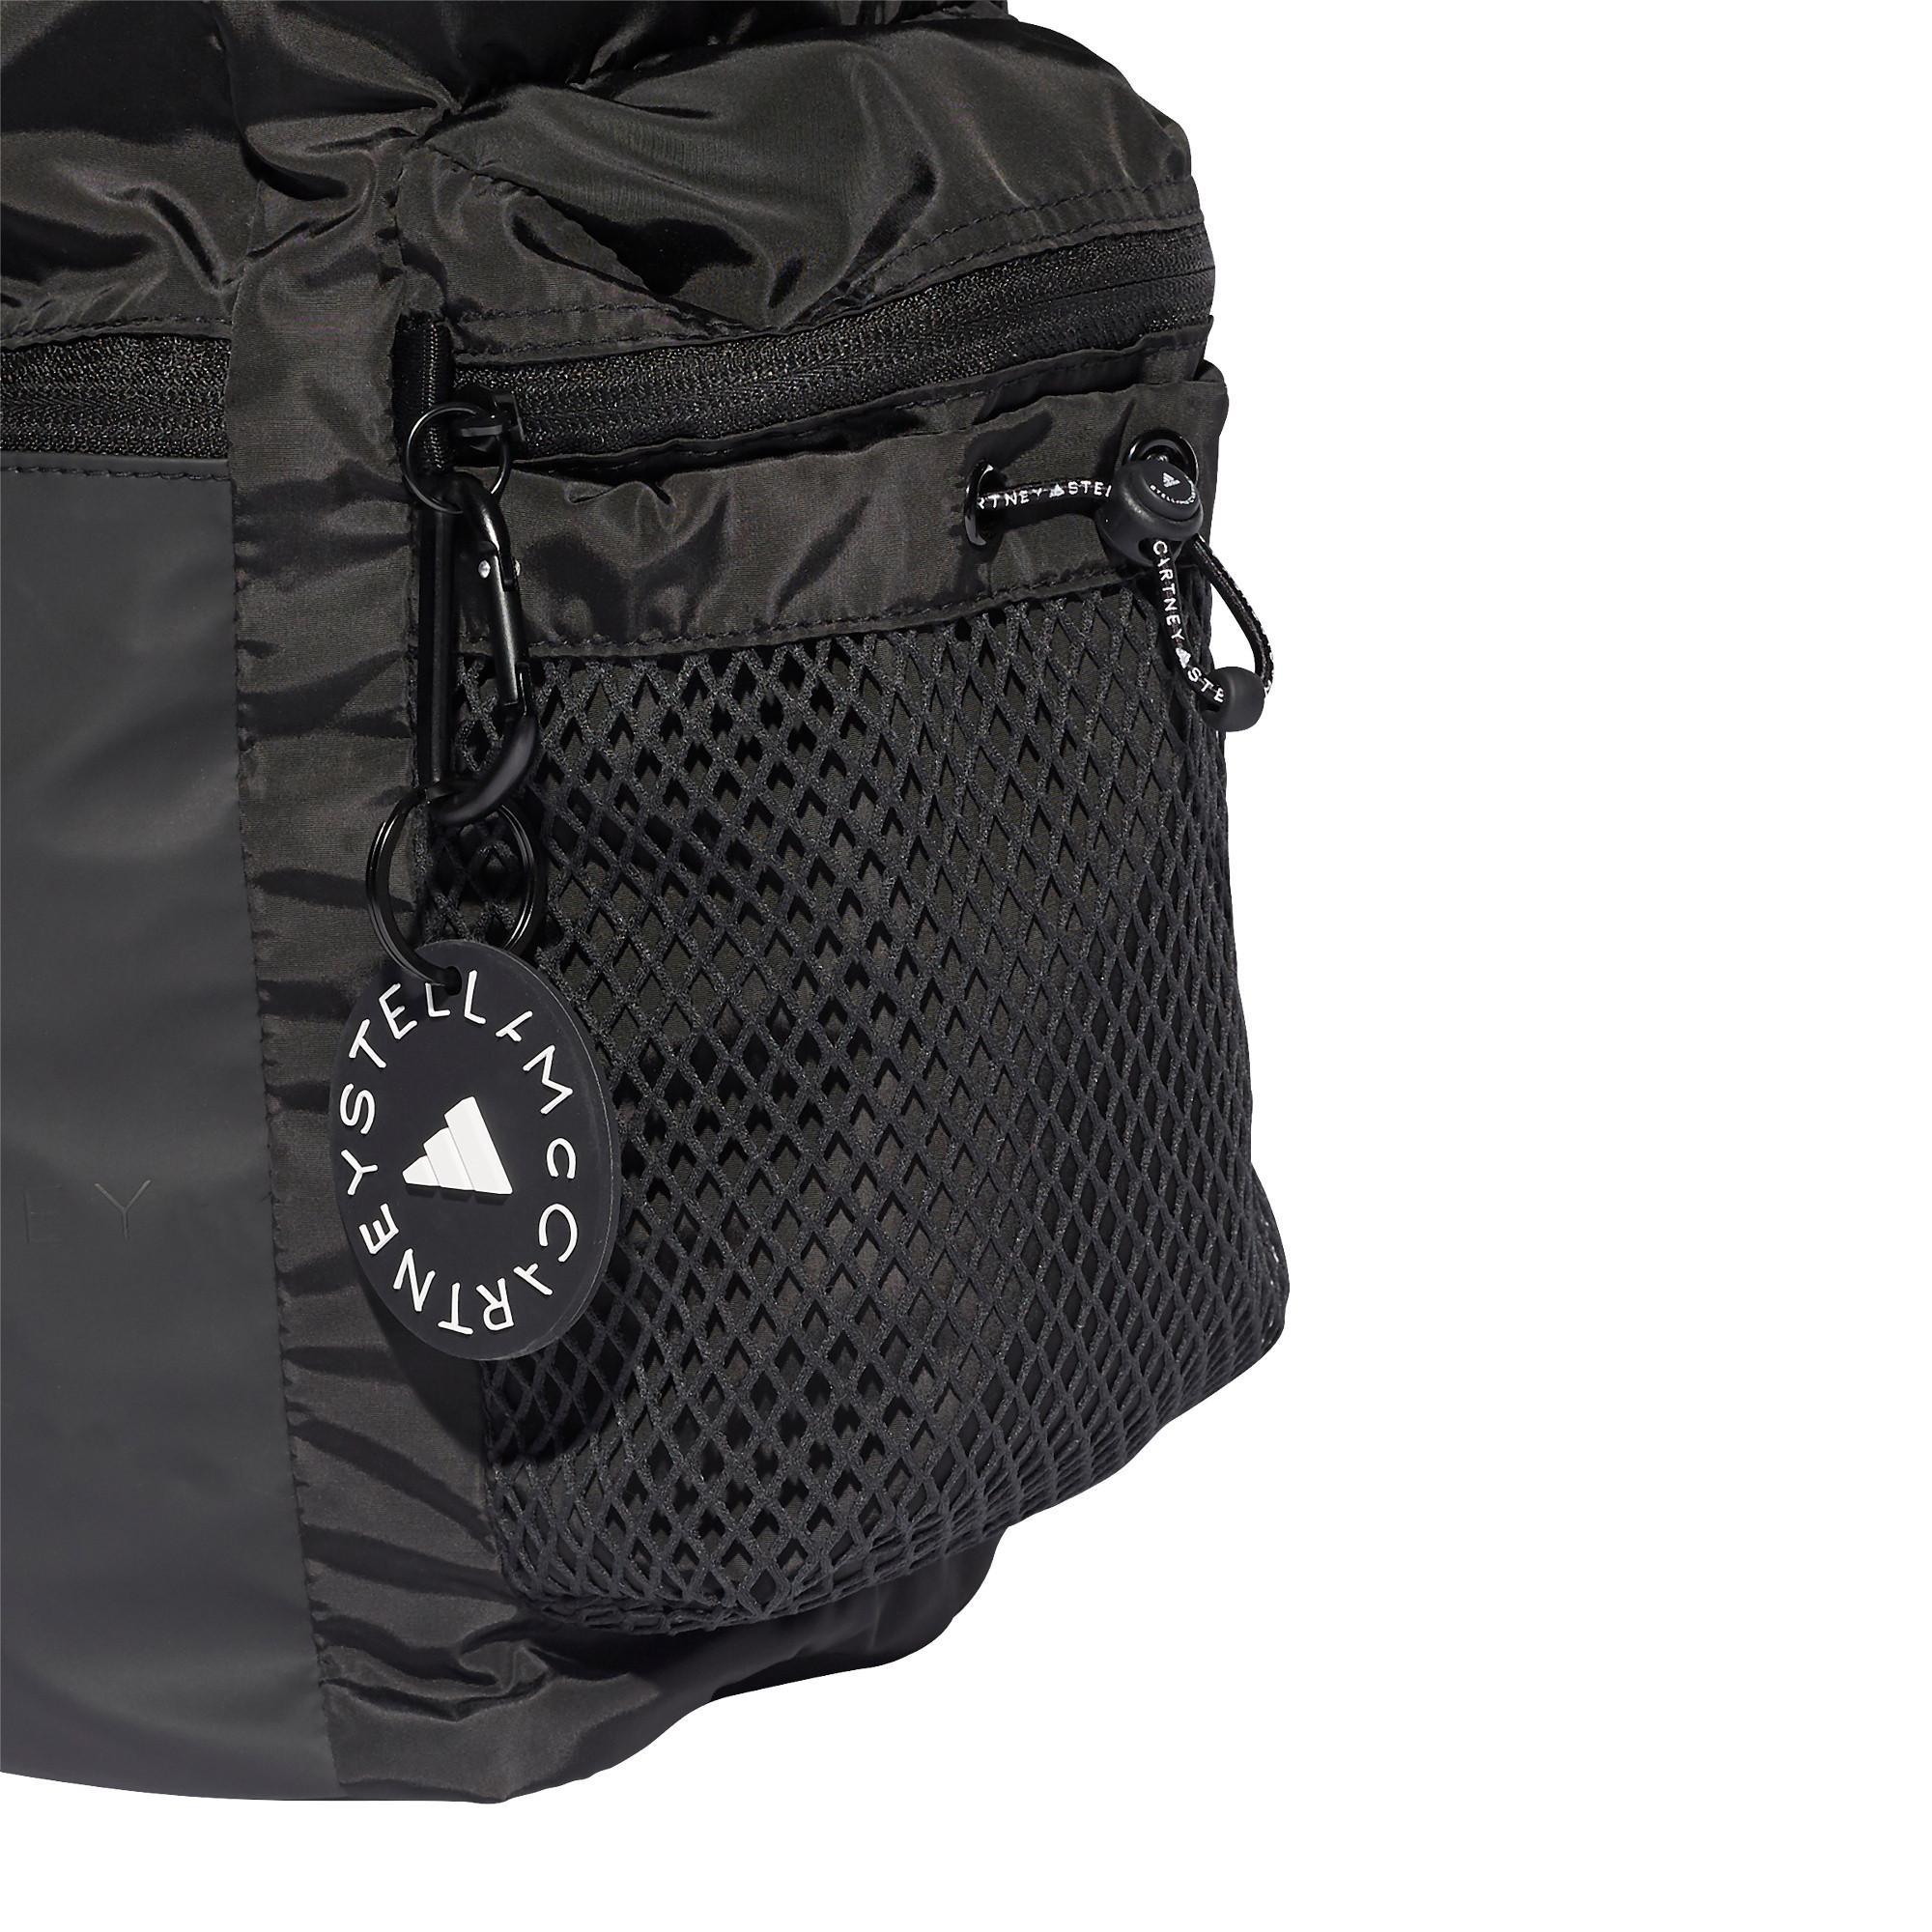 Zaino Asmc Backpack, Nero, large image number 4